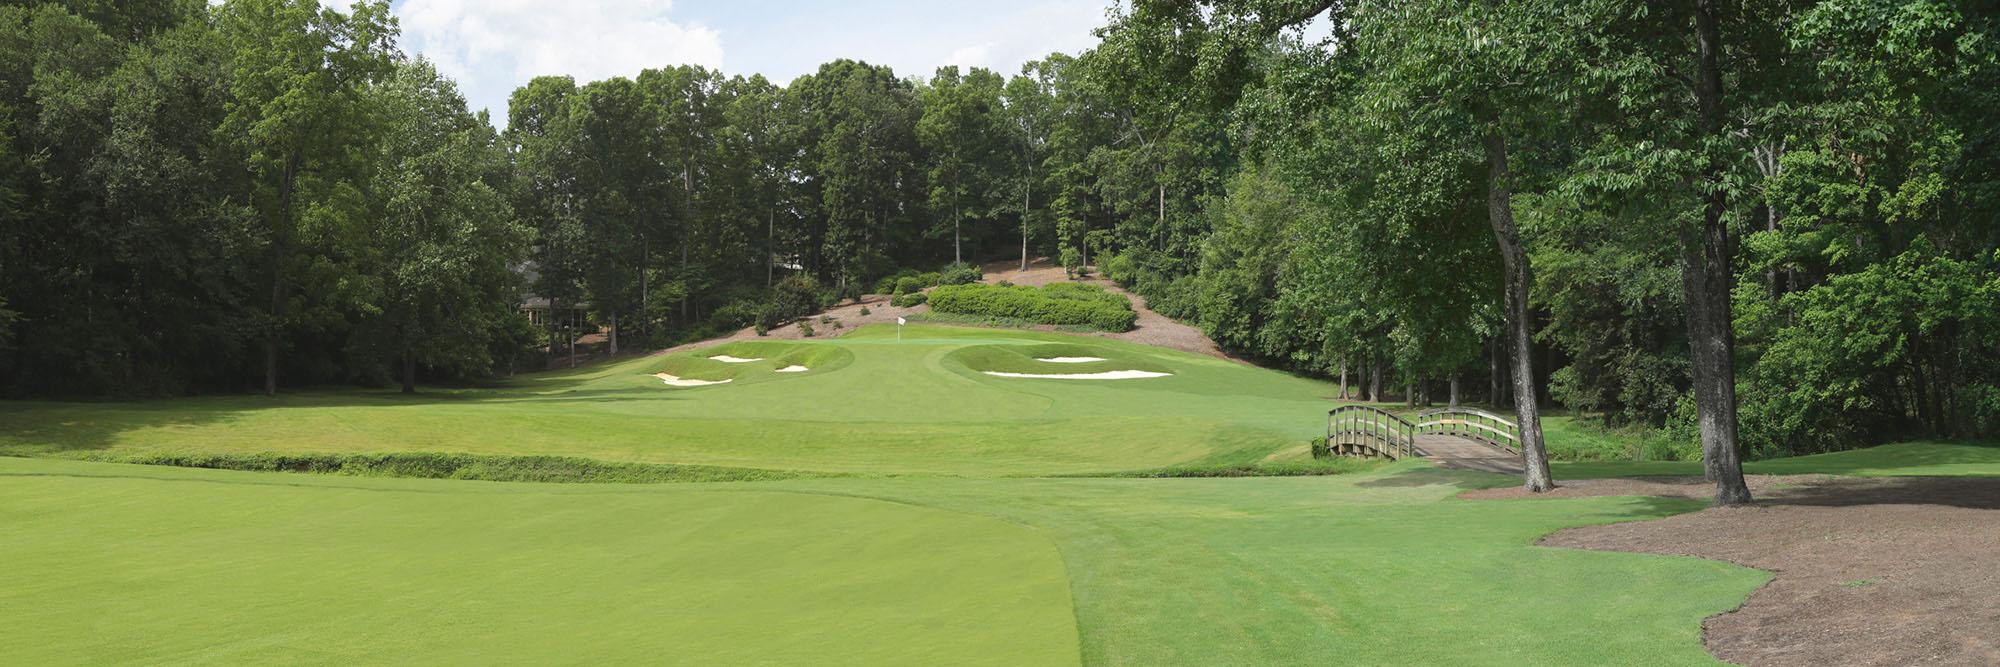 Golf Course Image - River Run Country Club No. 16